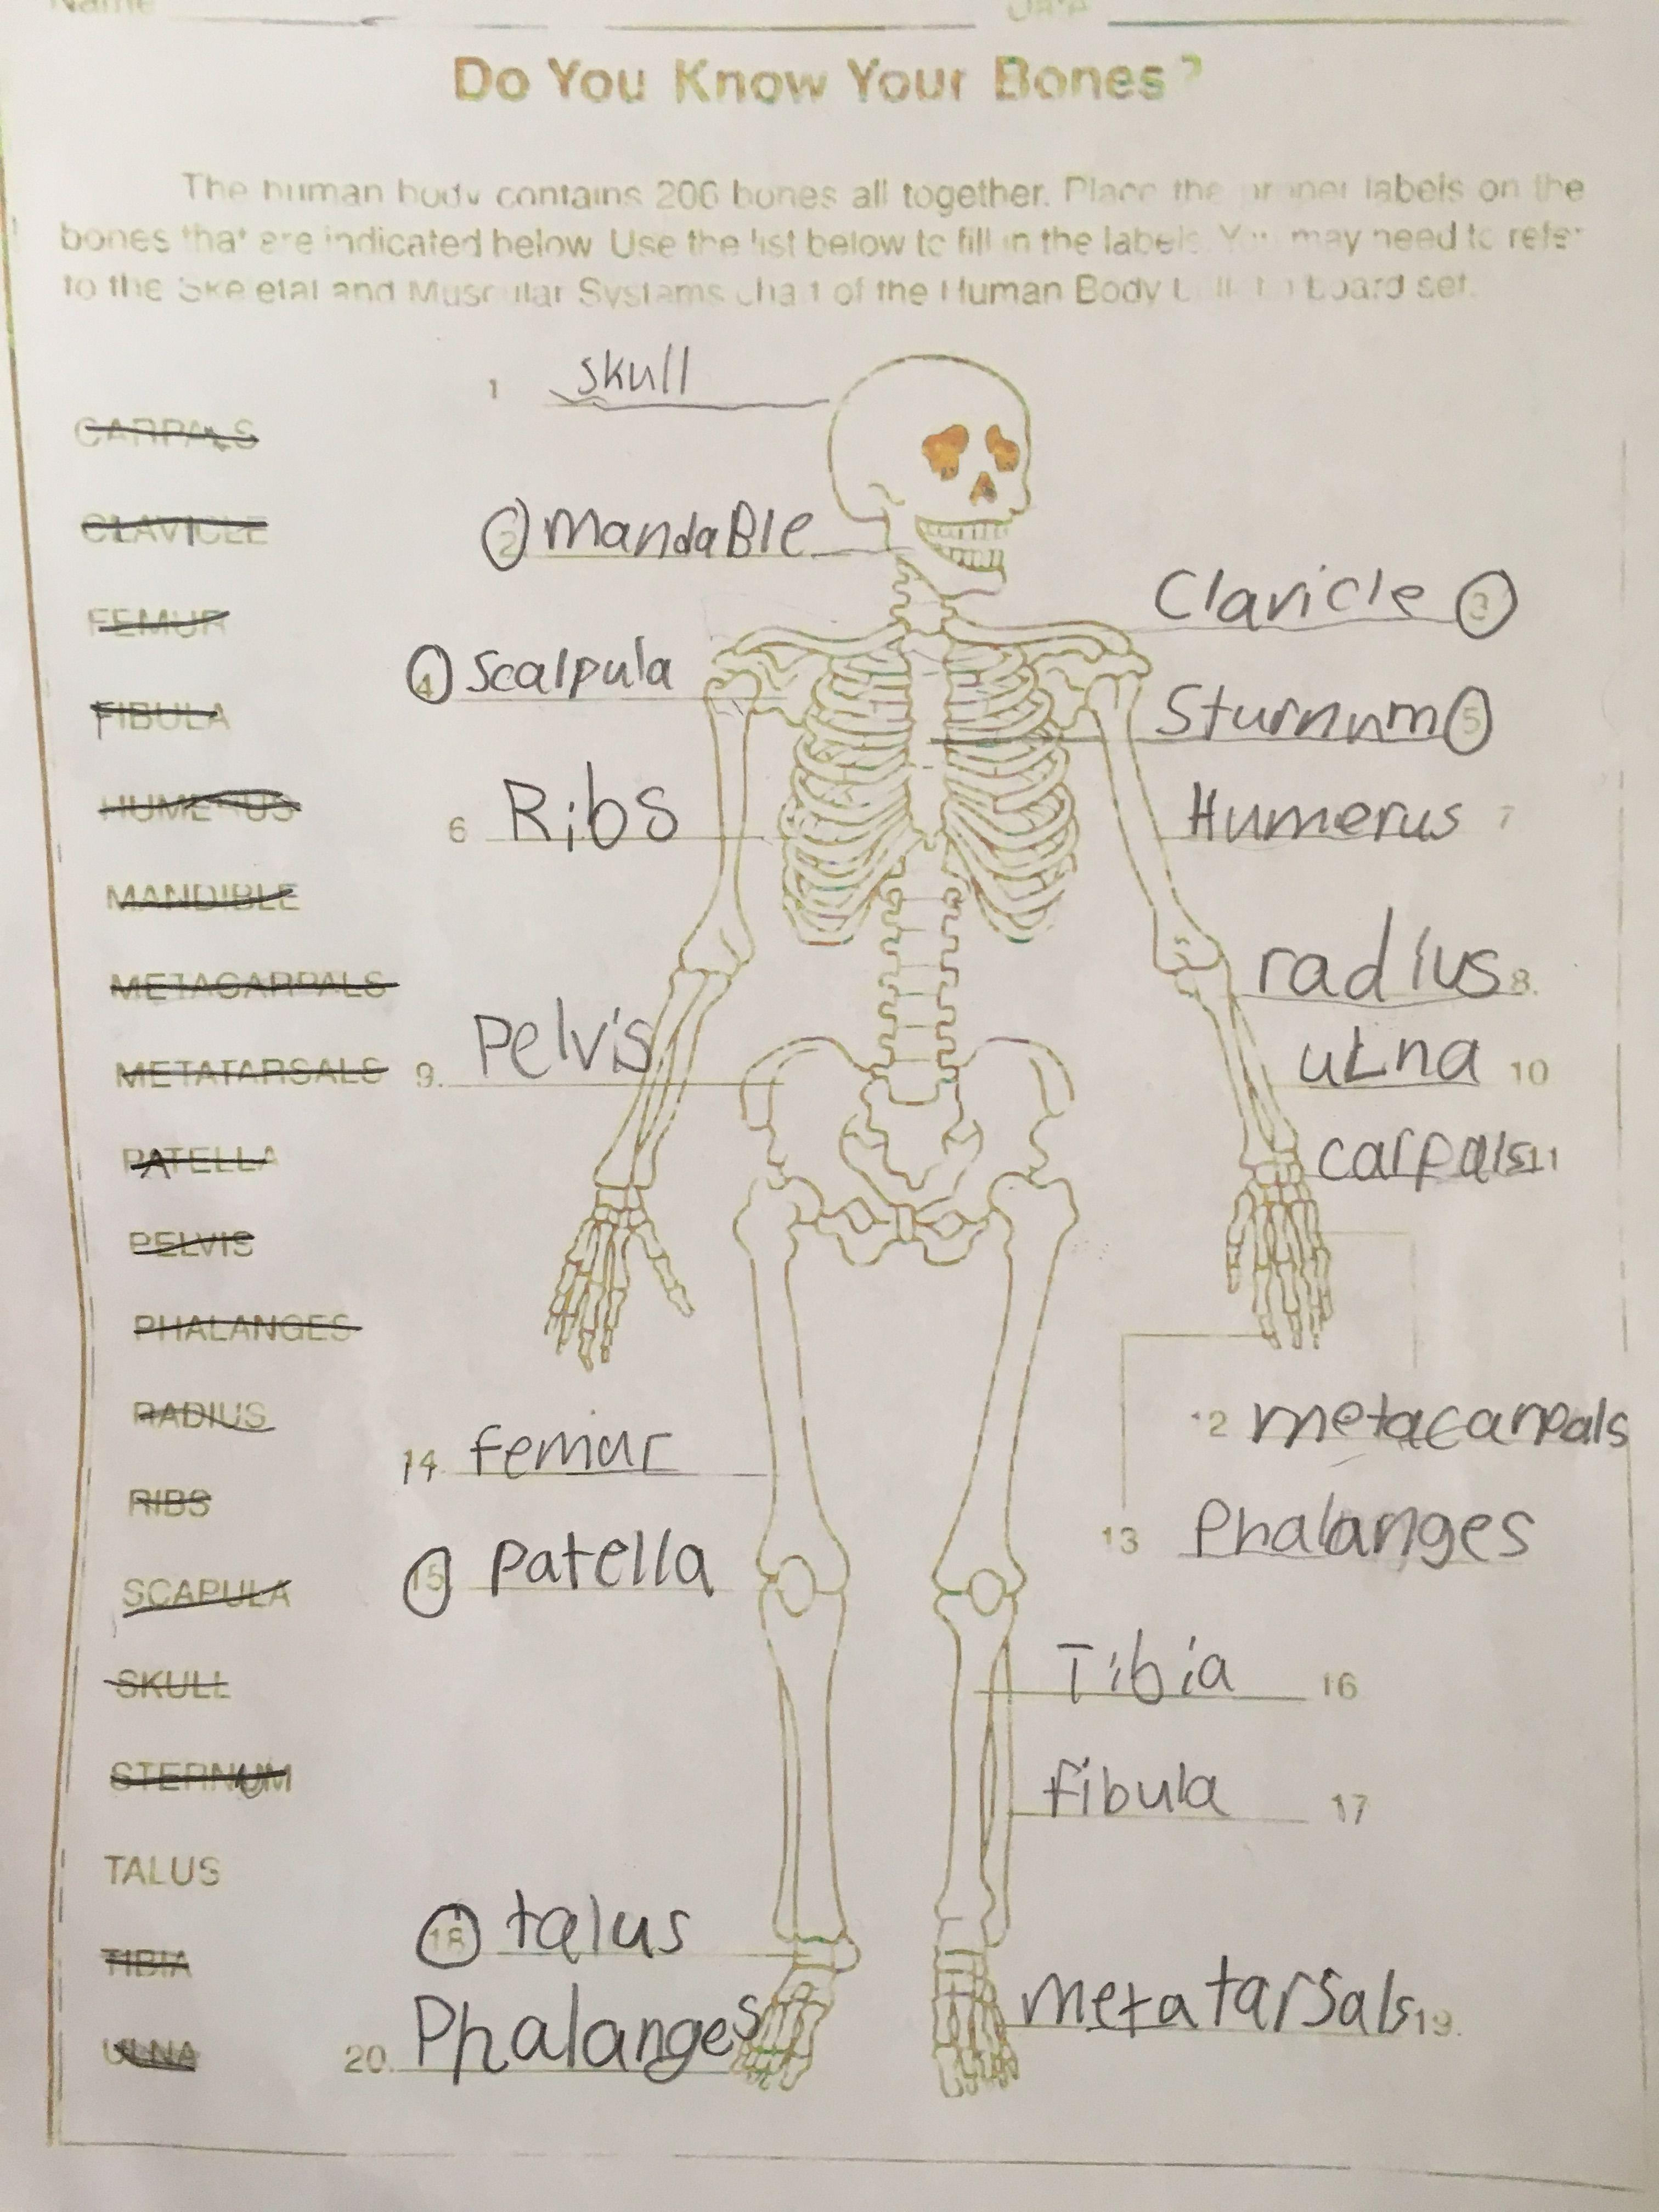 Bones Worksheet For Nutrition Club